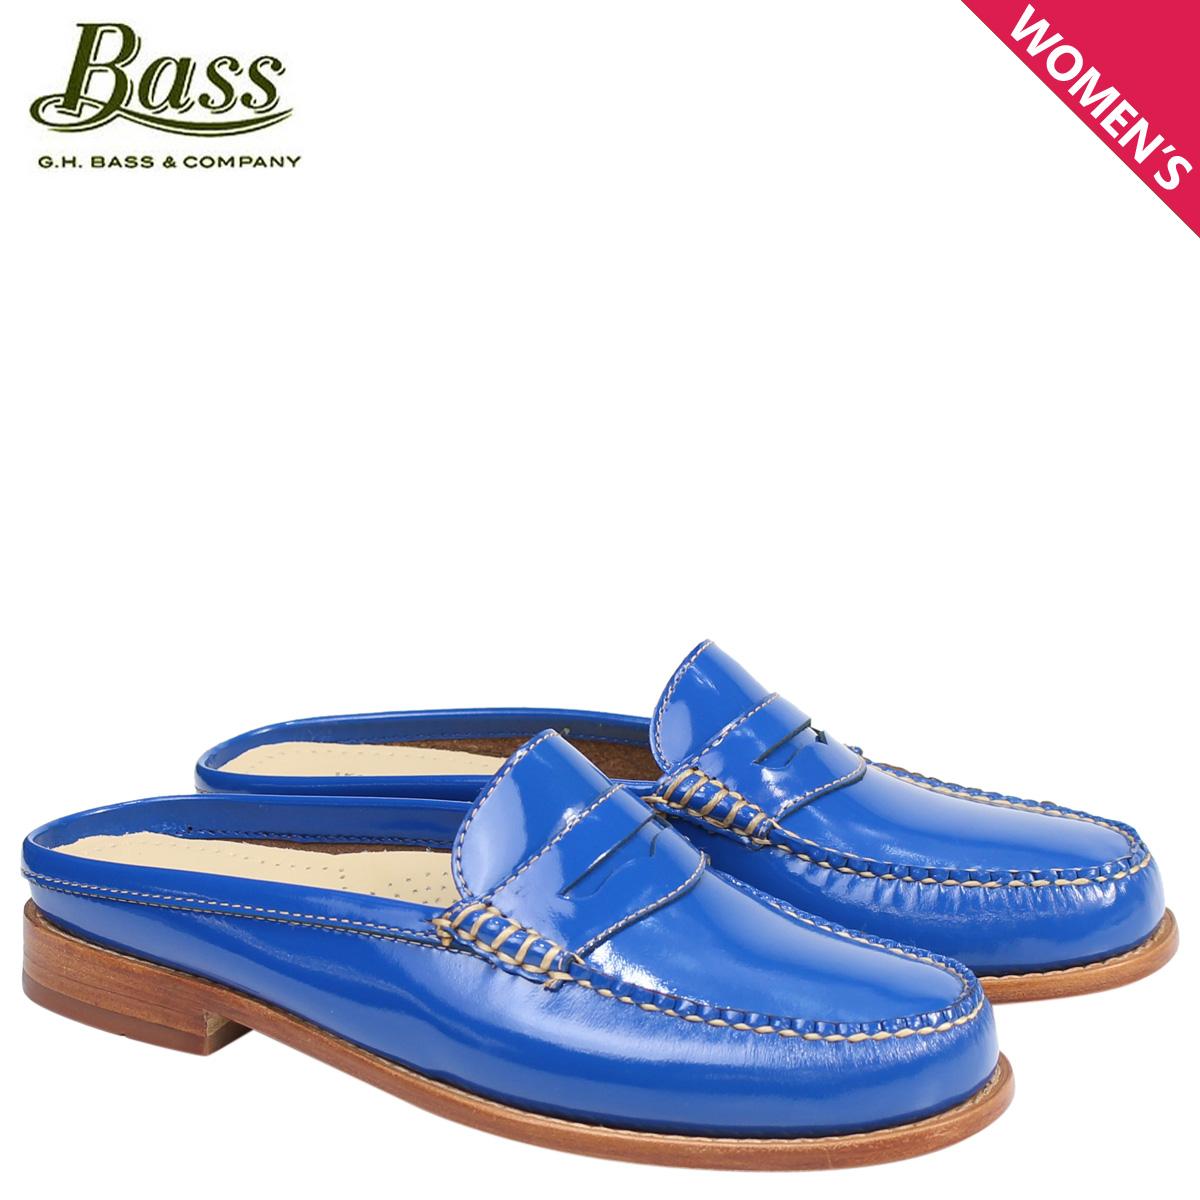 G.H. BASS ローファー ジーエイチバス レディース サンダル スリッパ バブーシュ WYNN PATENT LEATHER MULE WEEJUNS 71-22857 靴 ブルー